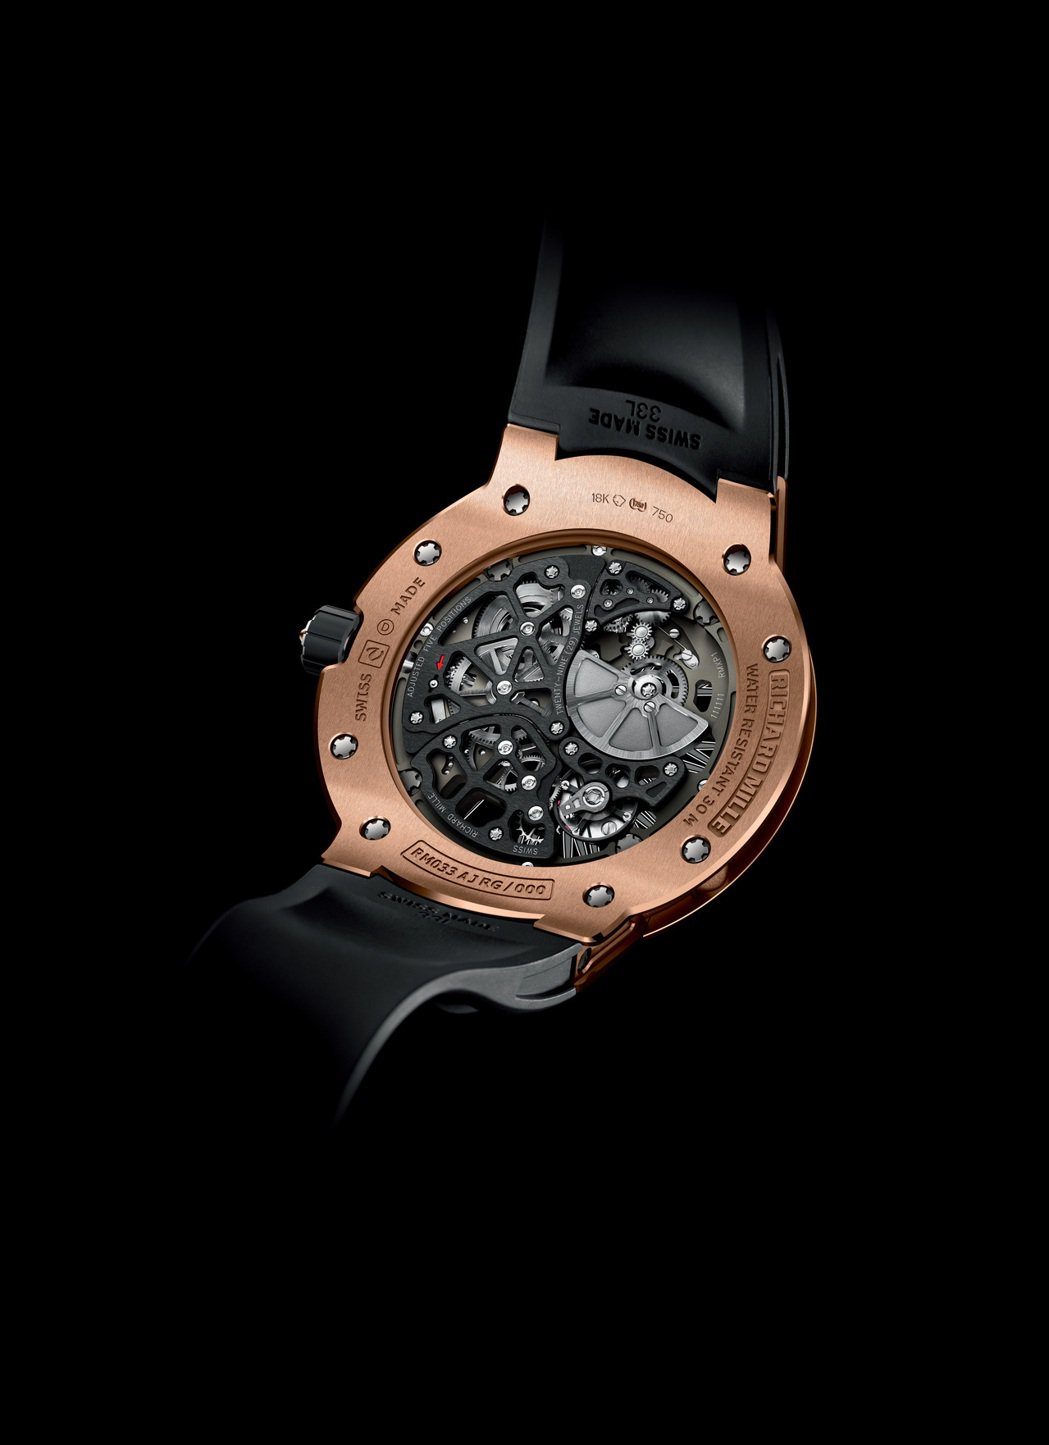 RICHARD MILLE RM033腕表,從透明底蓋即可見到,以往在中央的自動...